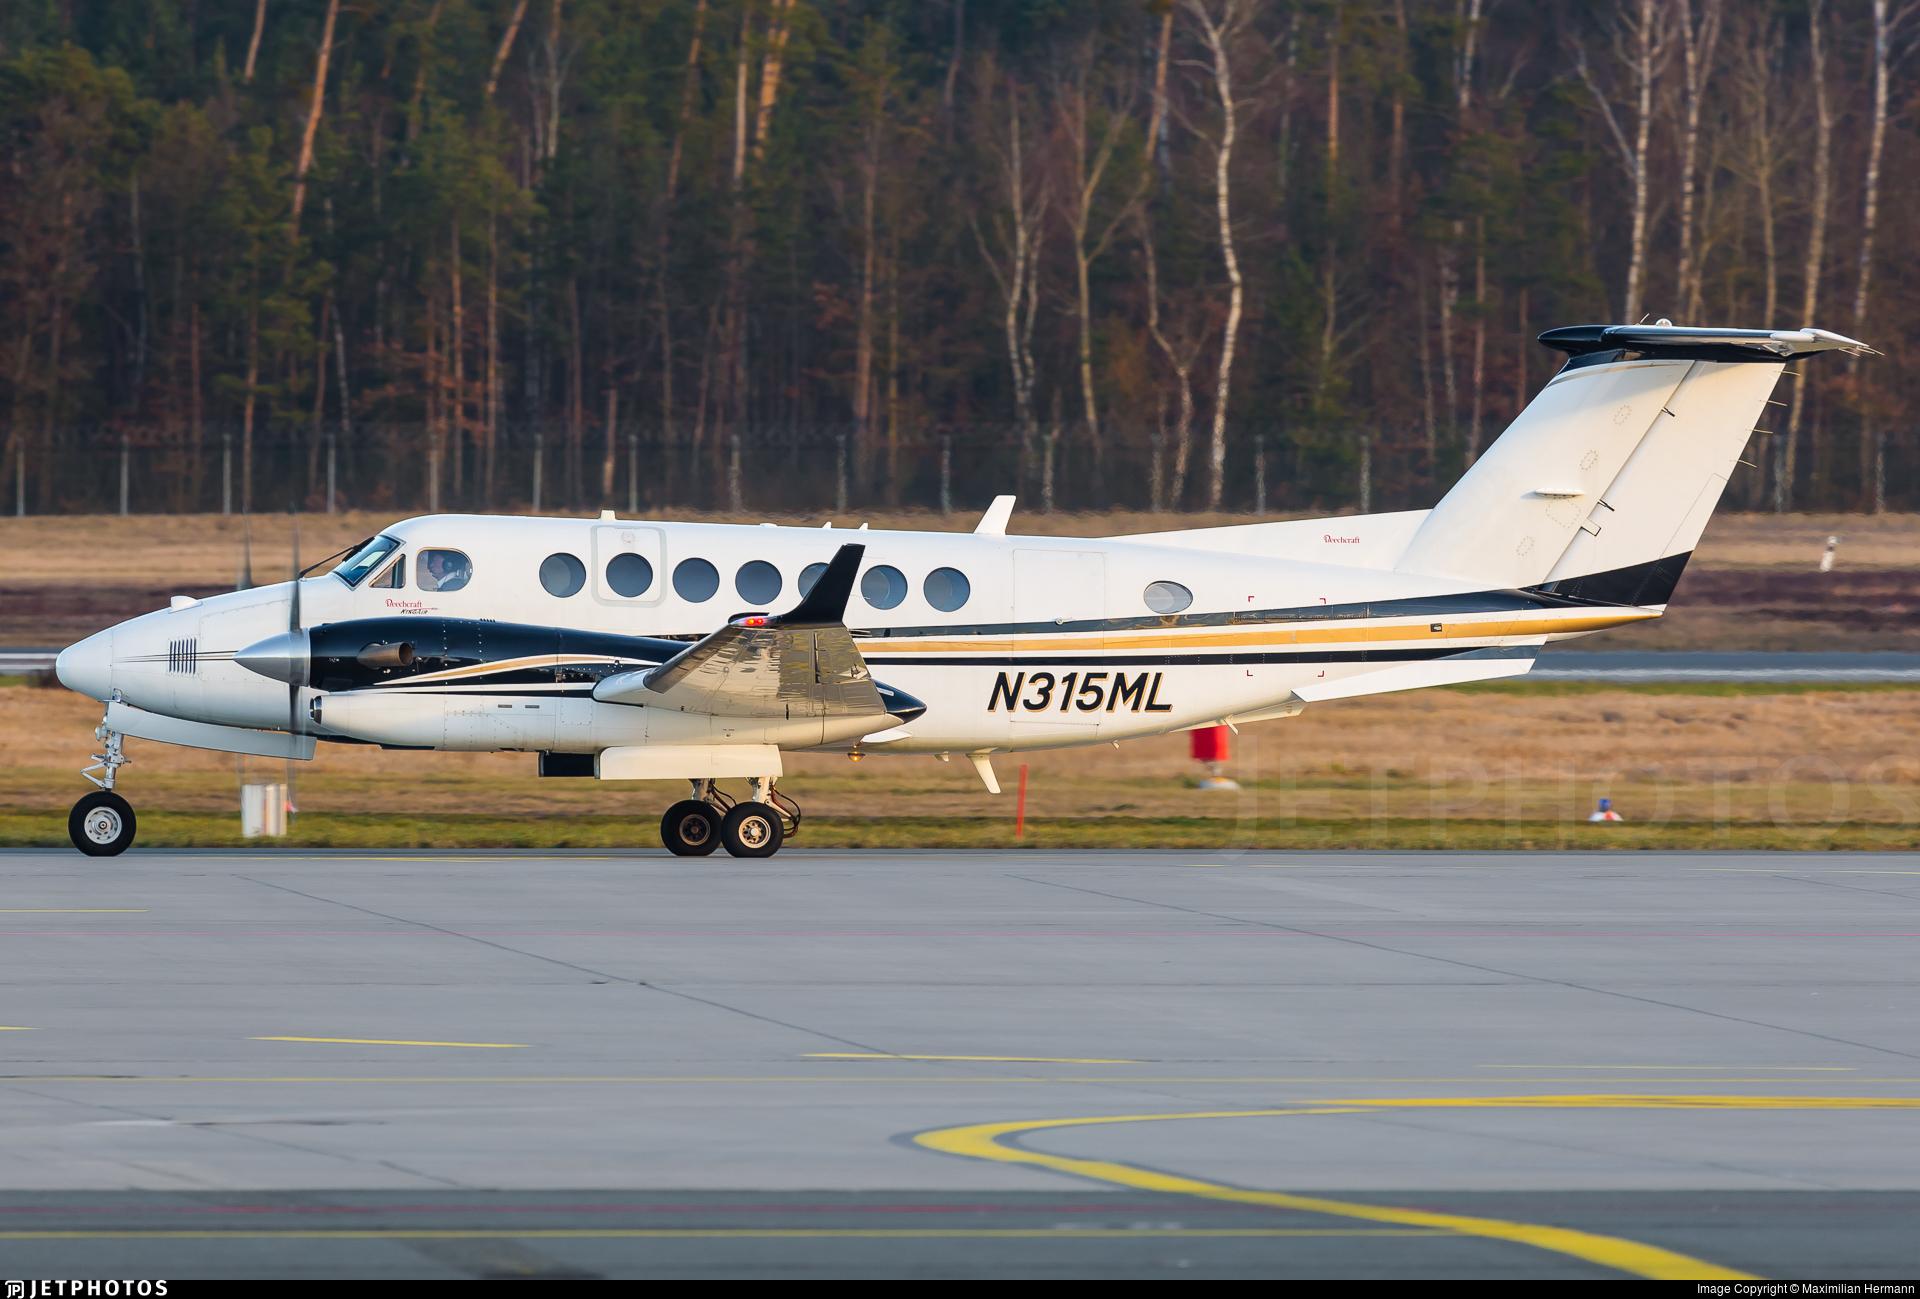 N315ML - Beechcraft B300 King Air 350 - Private